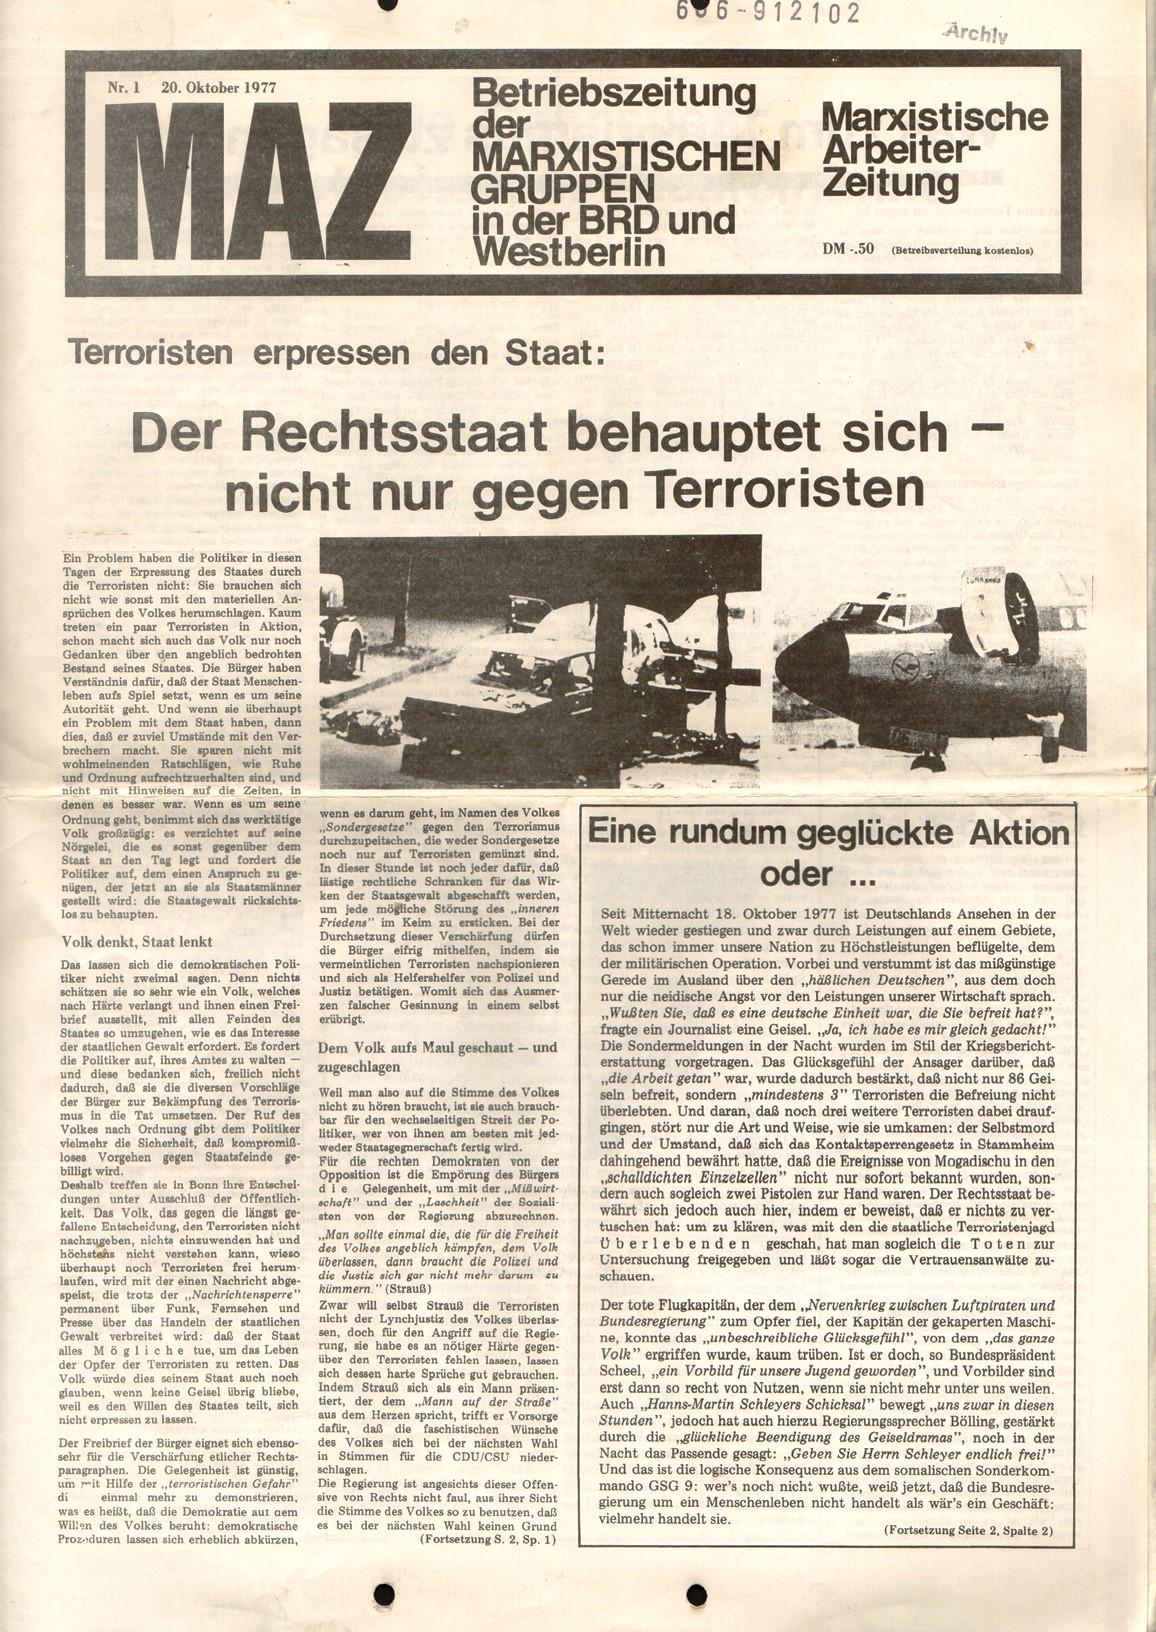 Muenchen_MG_MAZ_19771020_01